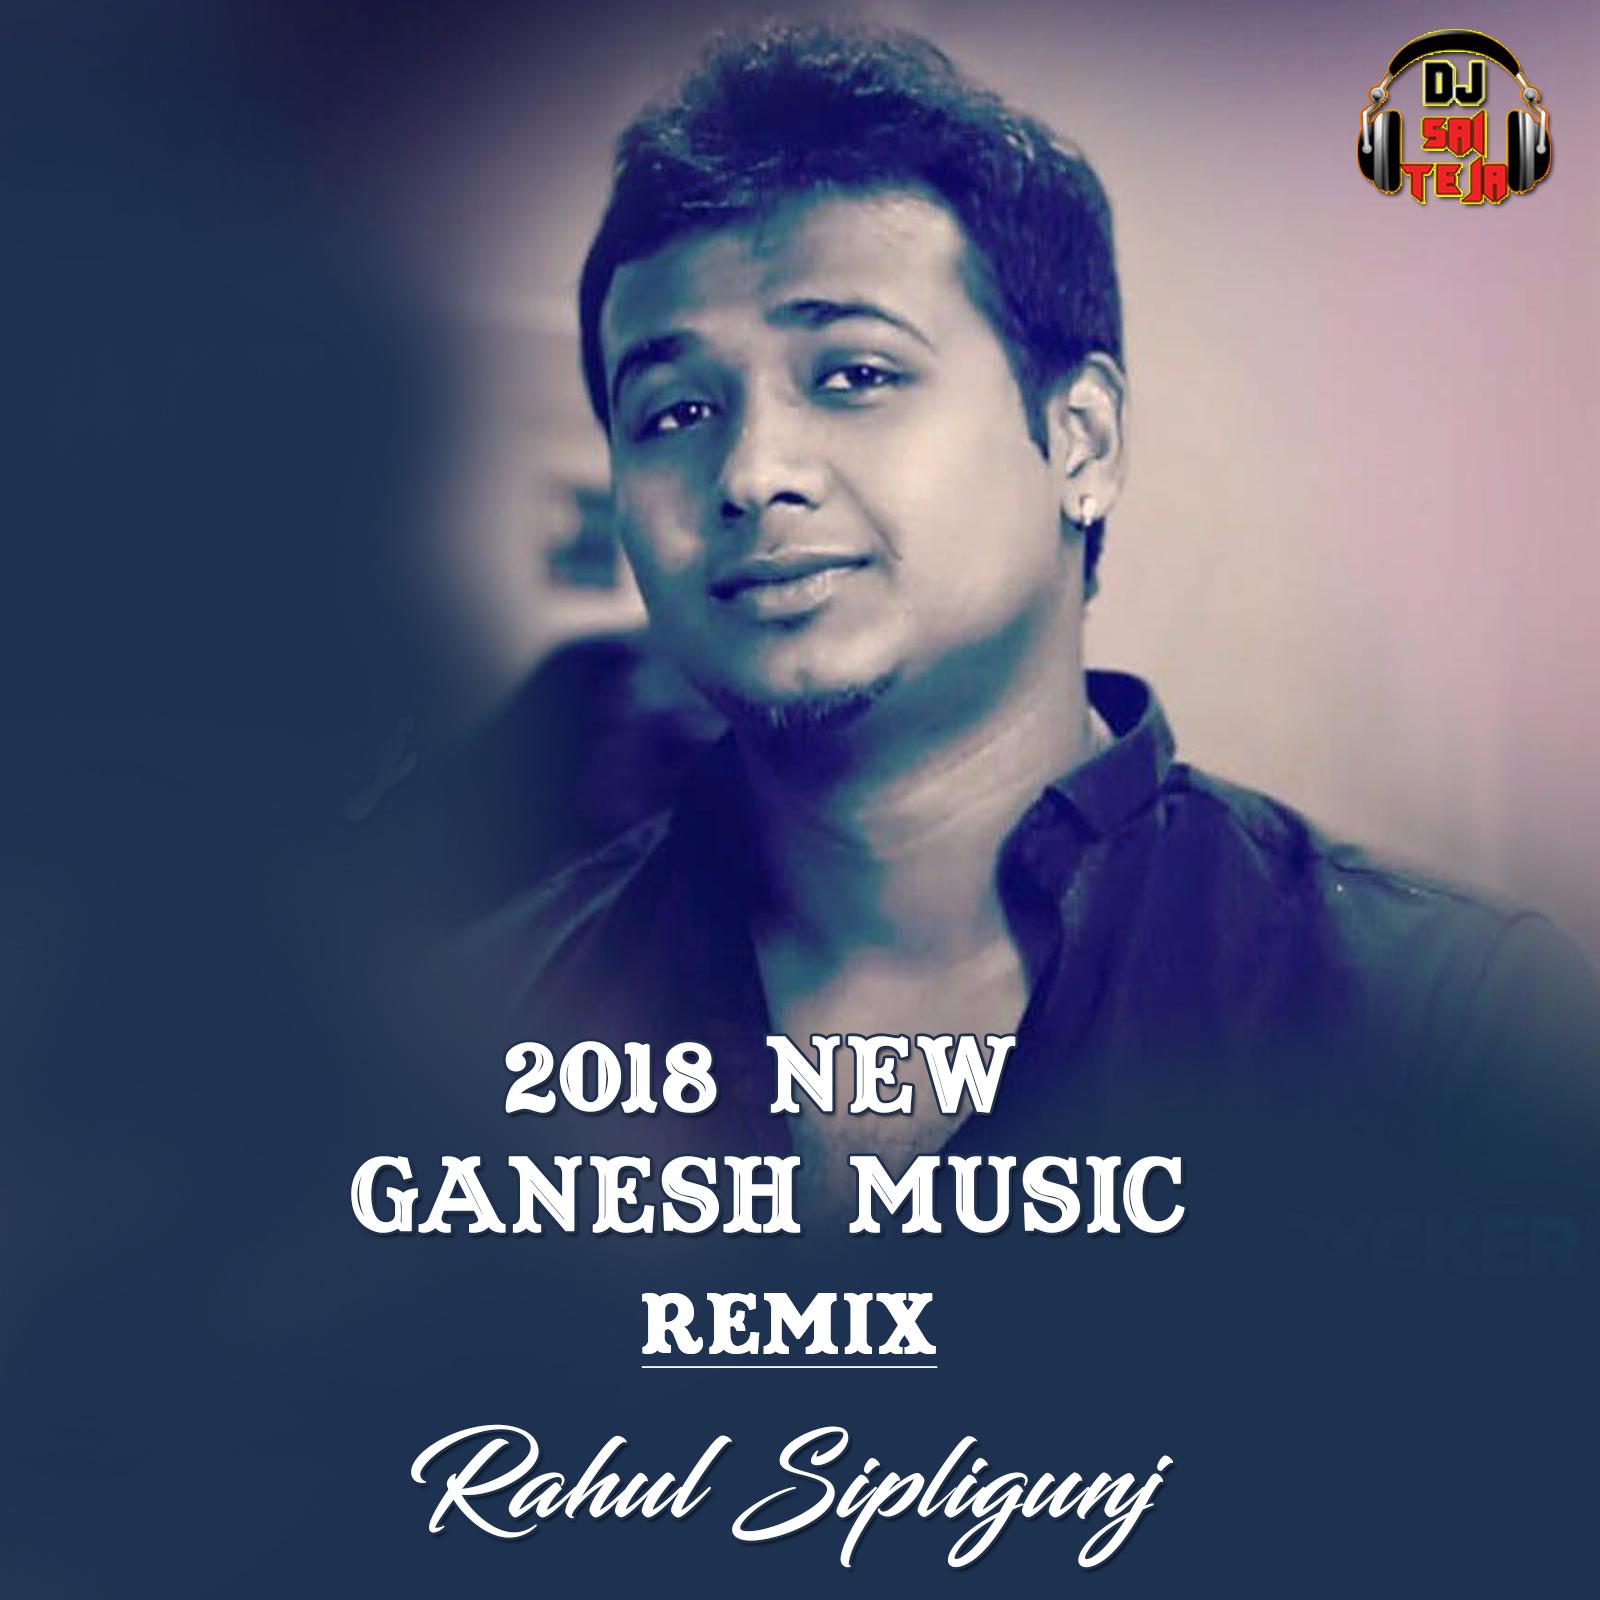 Rahul Sipligunj 2018 Ganesh song ( Remix ) Dj Sai Teja Sdpt